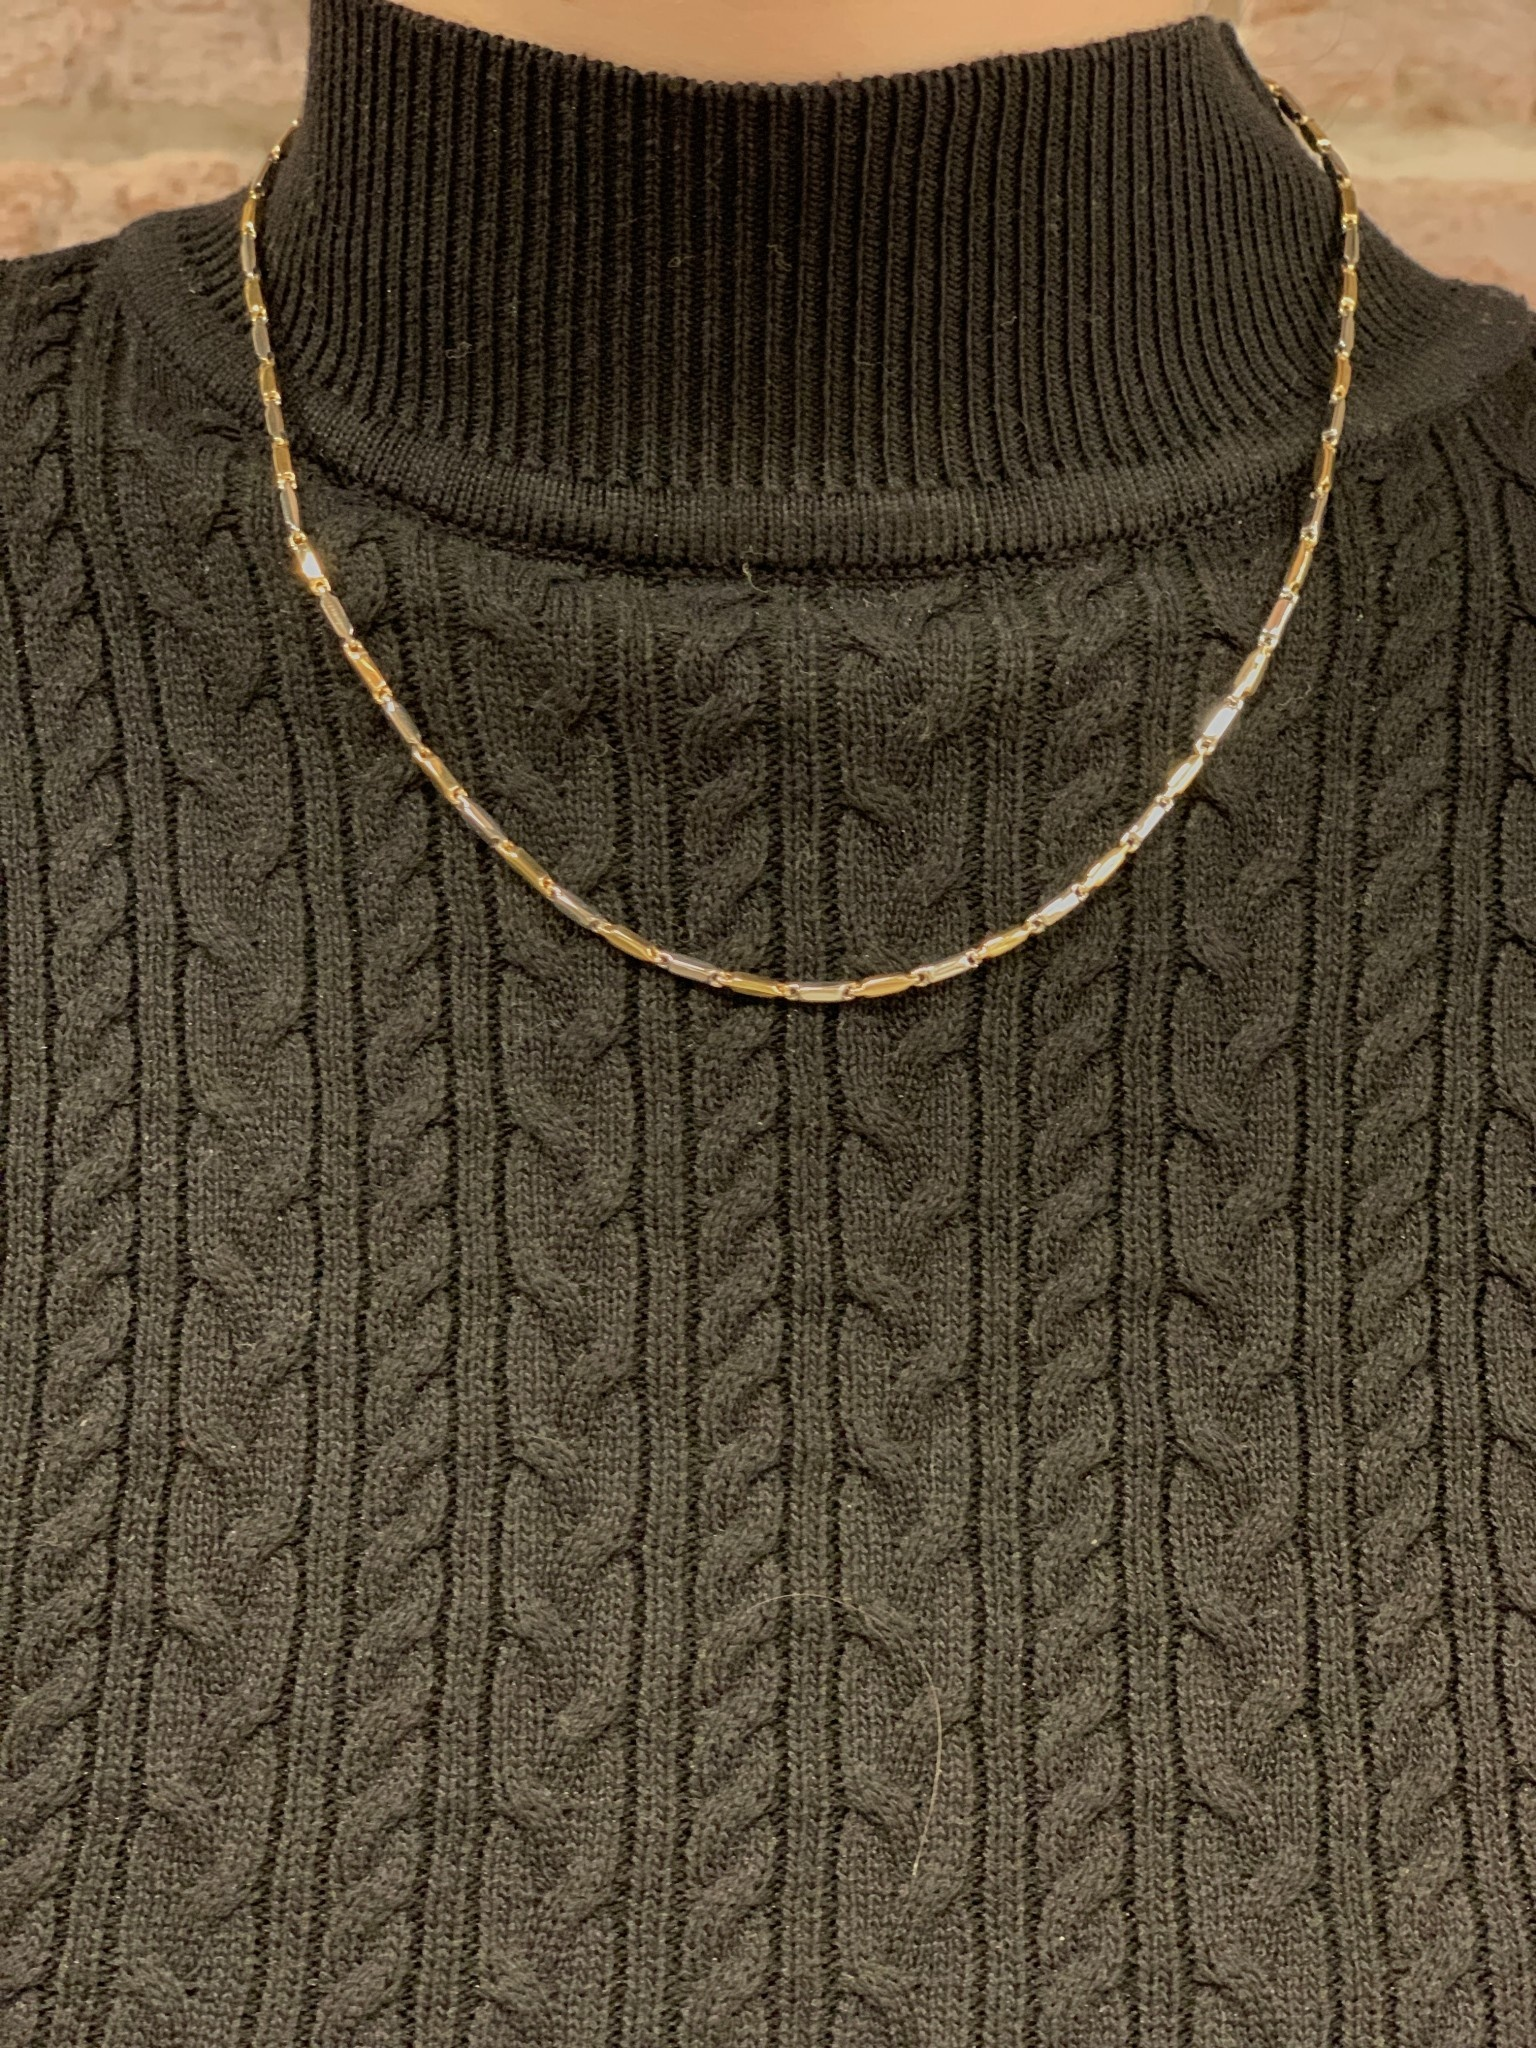 Monzario Oro Monzario collier 865Cbic 45cm. geel/witgoud 14k